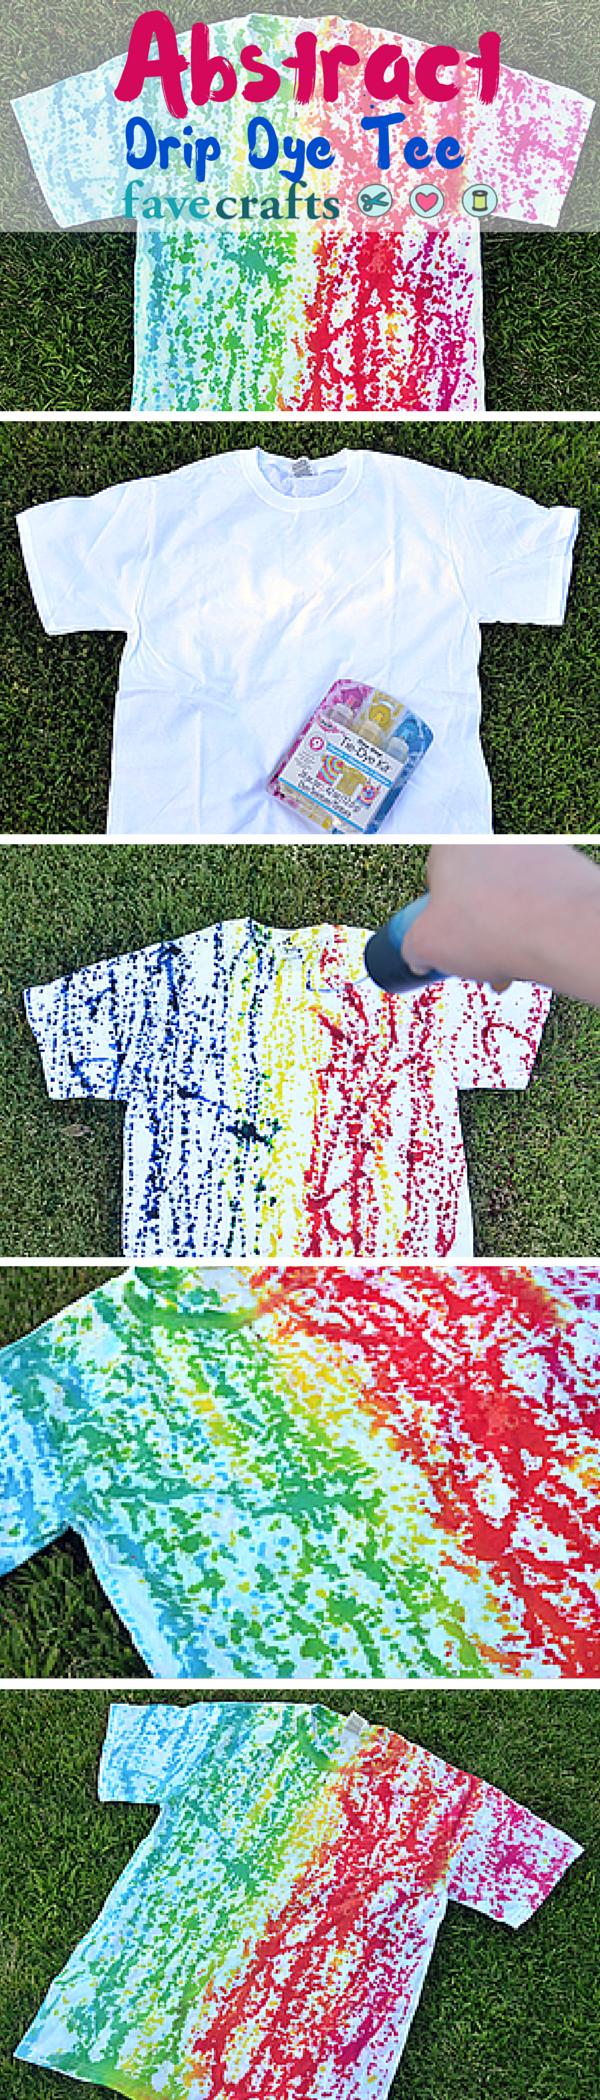 Easy Tie Dye Shirt Patterns